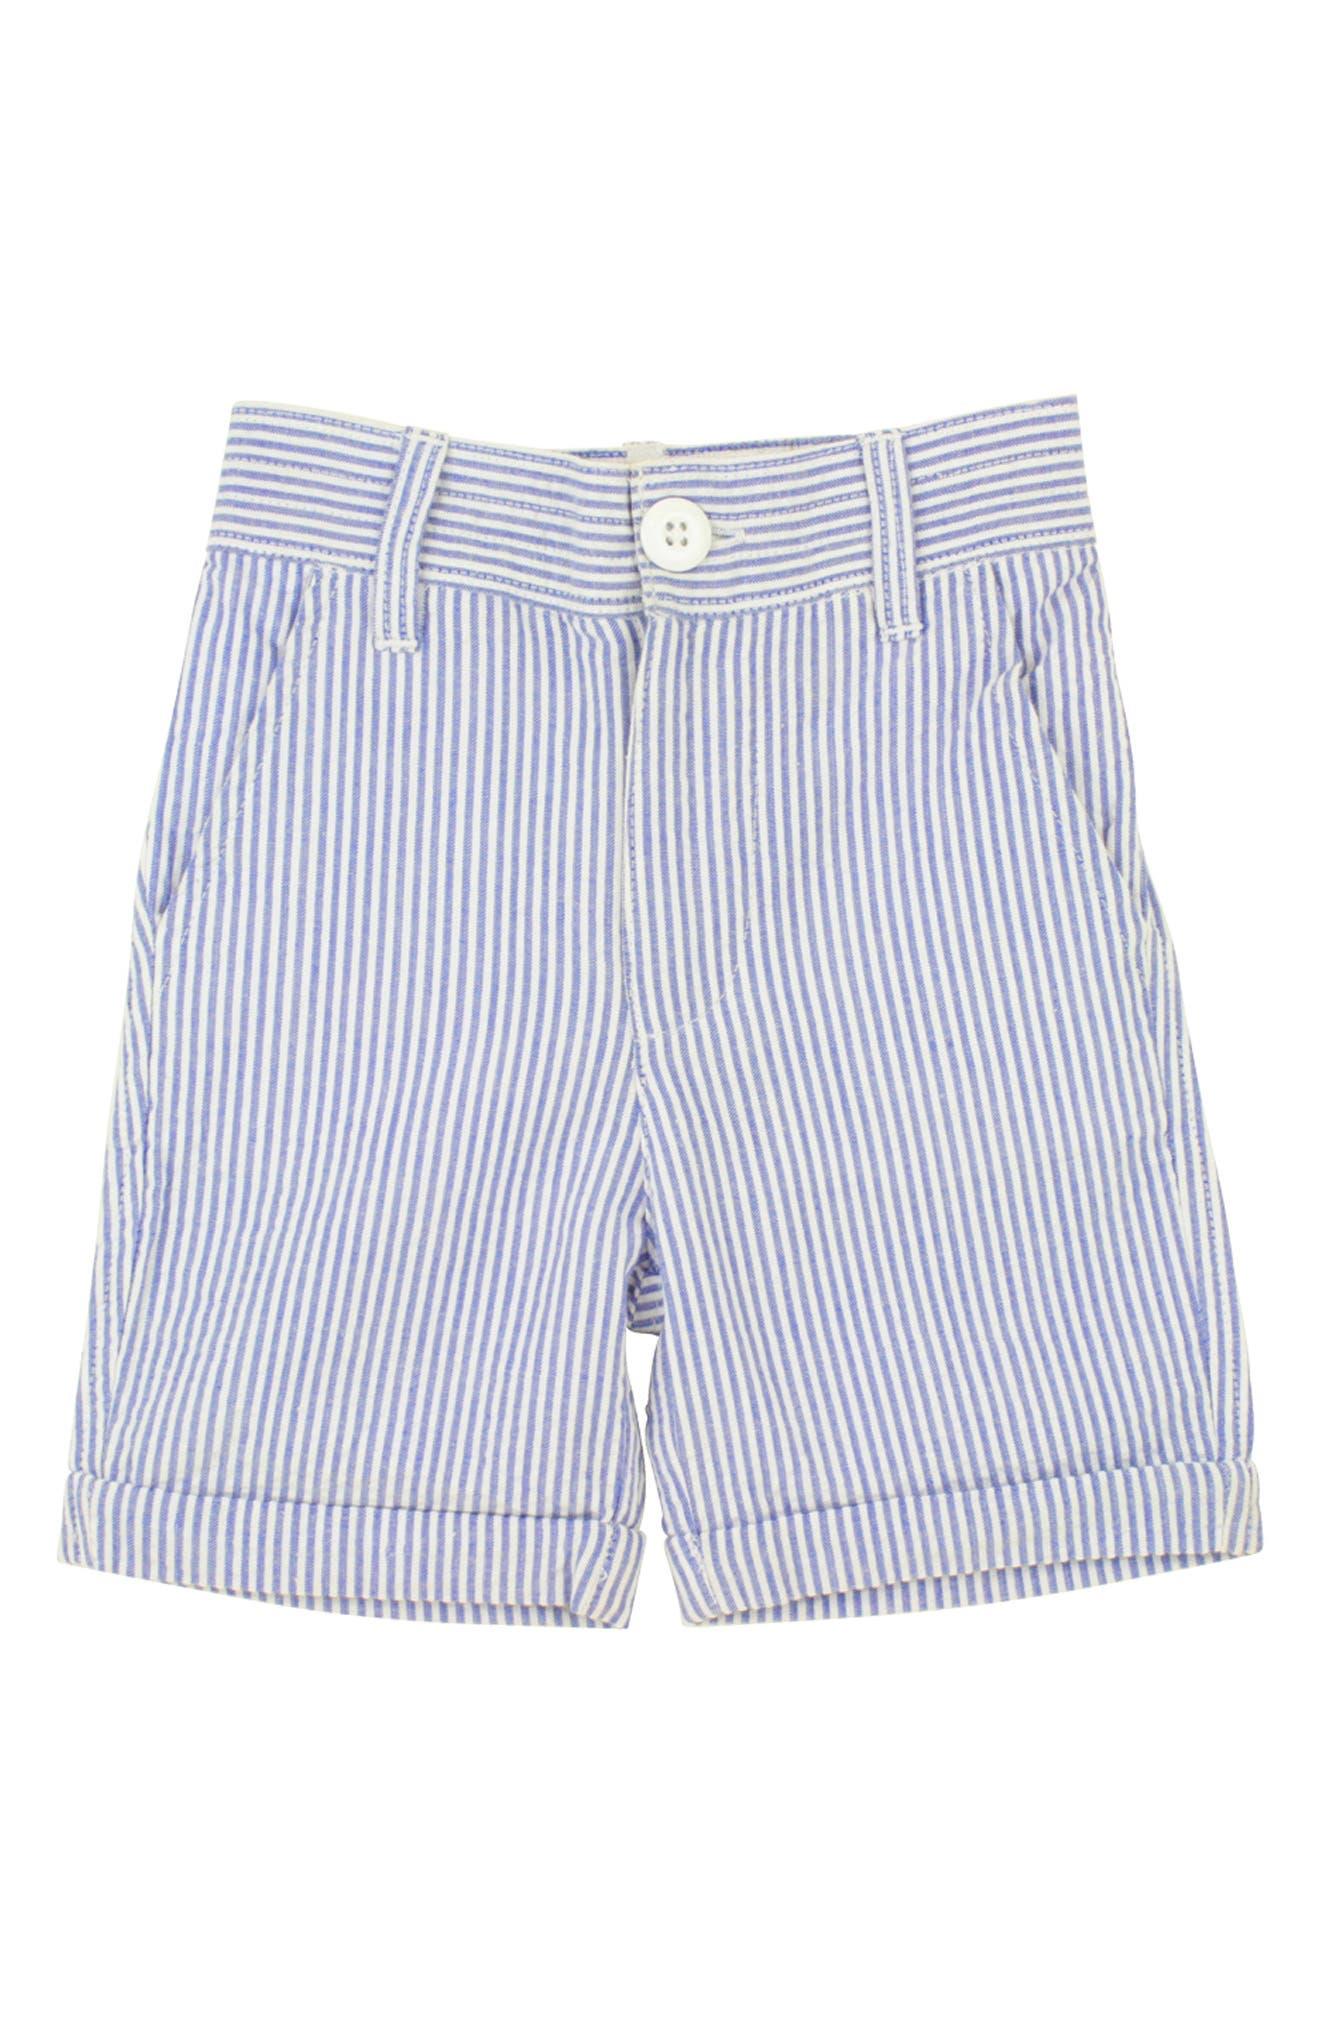 RUGGEDBUTTS, Seersucker Vest & Shorts Set, Alternate thumbnail 2, color, BLUE